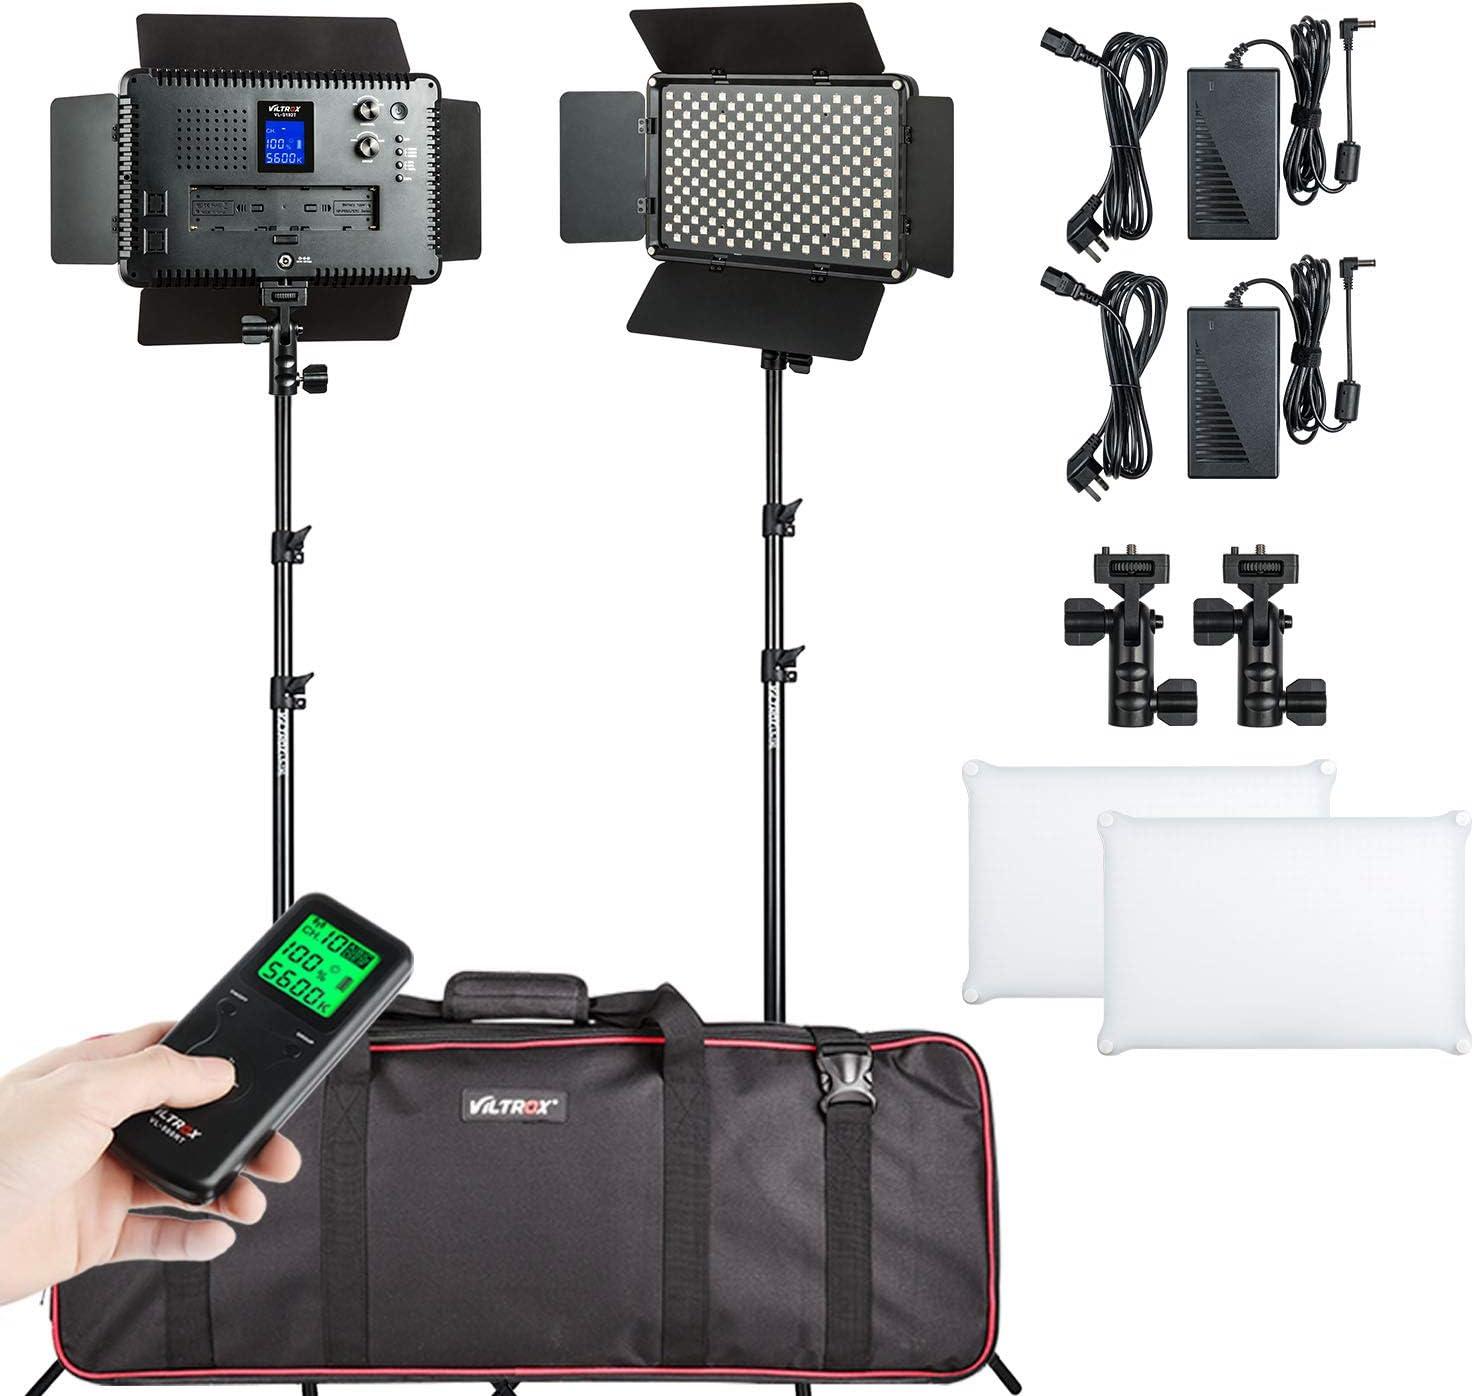 2 Packs Bi-Color LED Video Dimmable VILTORX Camera Light St gift El Paso Mall